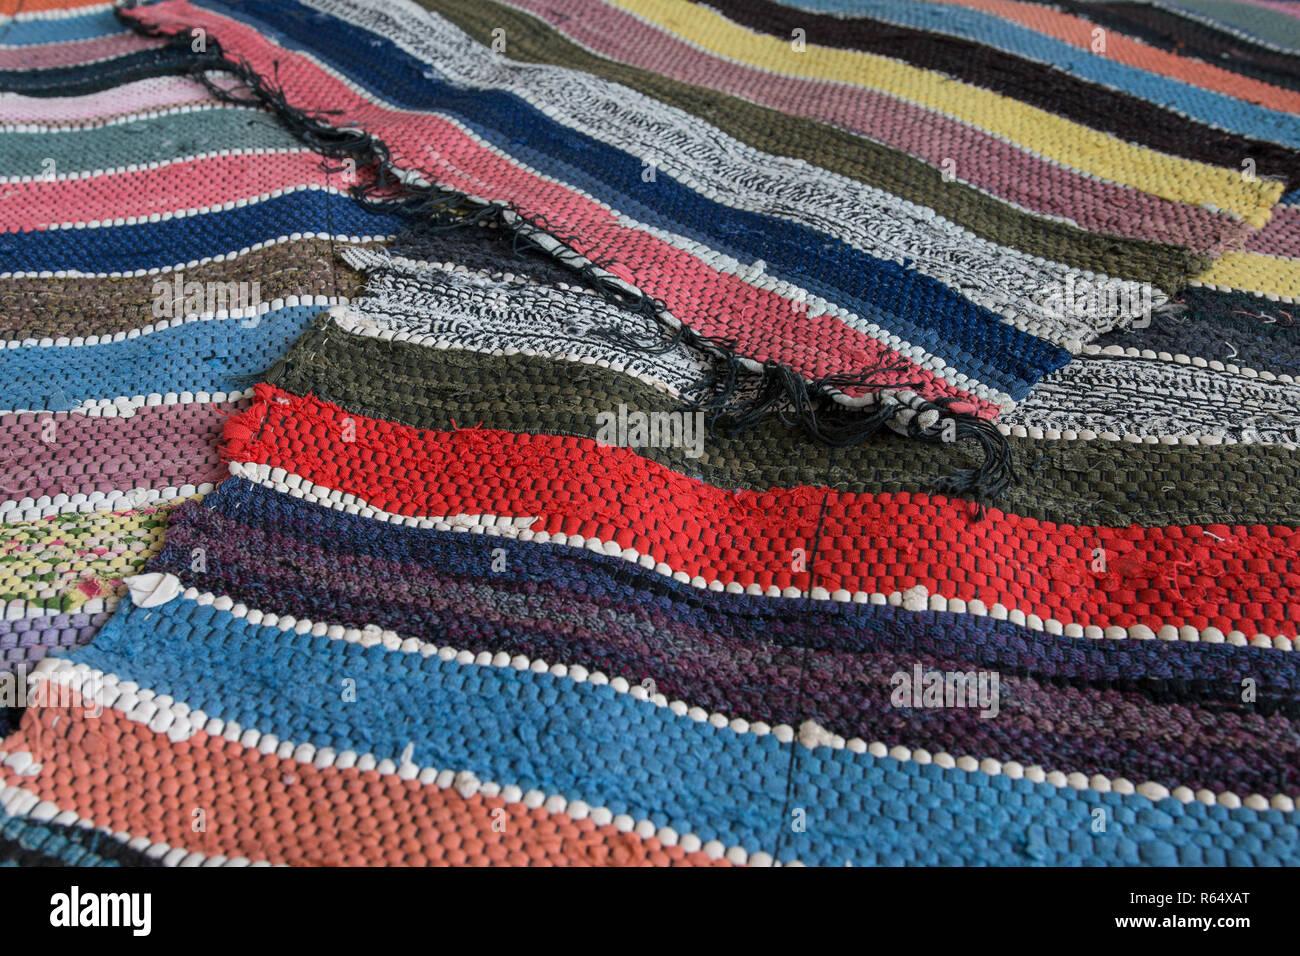 Traditional rustic striped multi-colored rug. Bright textile. Village eco concept. Selective focus - Stock Image